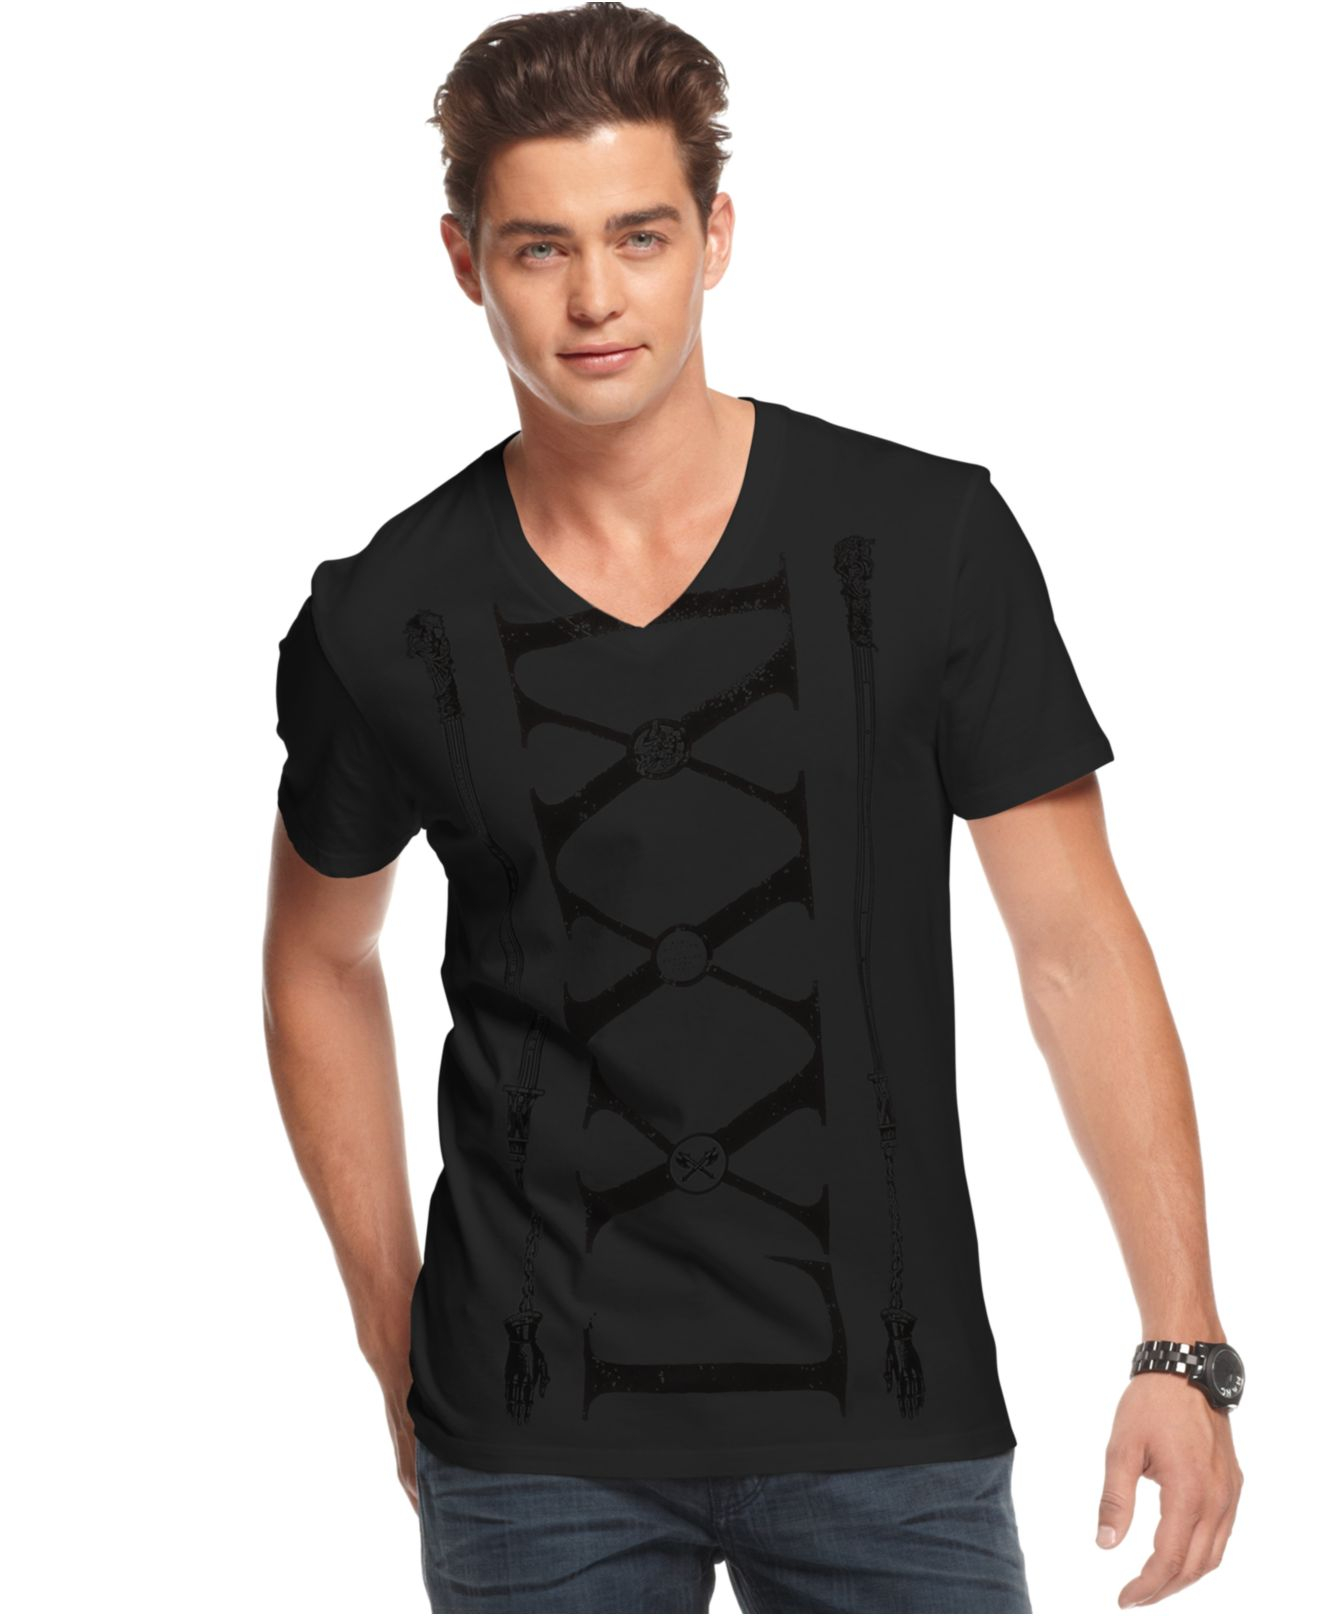 guess shirt roman numeral print t shirt in black for men. Black Bedroom Furniture Sets. Home Design Ideas